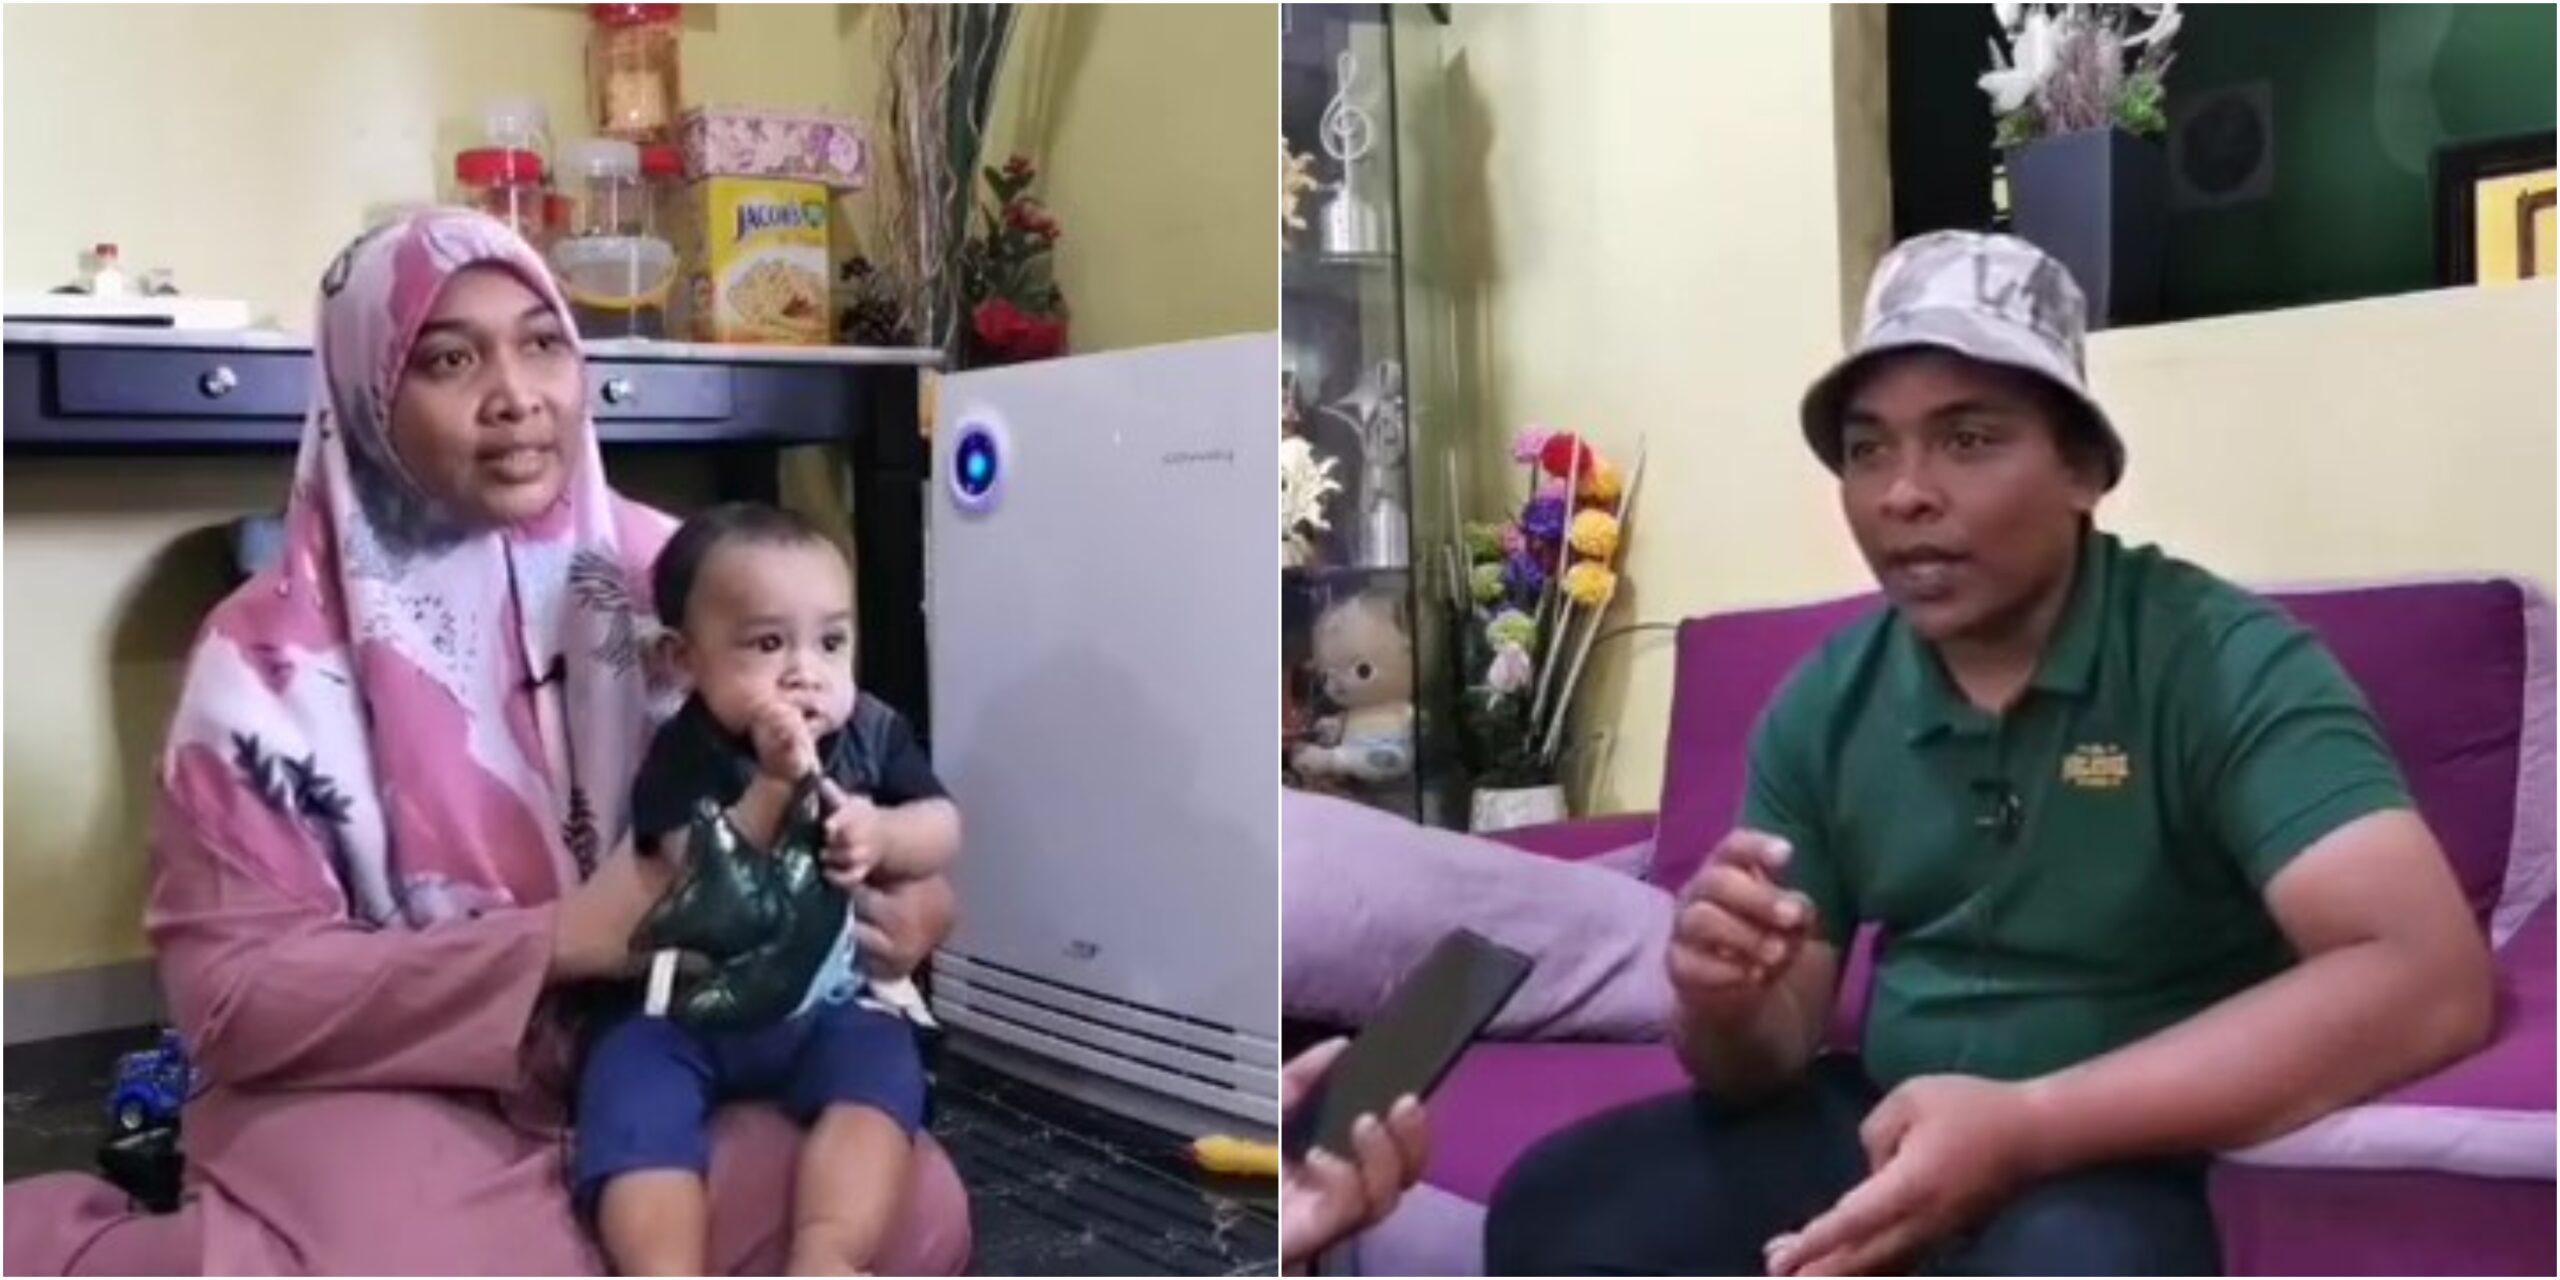 Pemergian Dicemburu Ramai, Rupanya Diam-Diam Sponsor Anak Yatim & Ustaz Ceramah